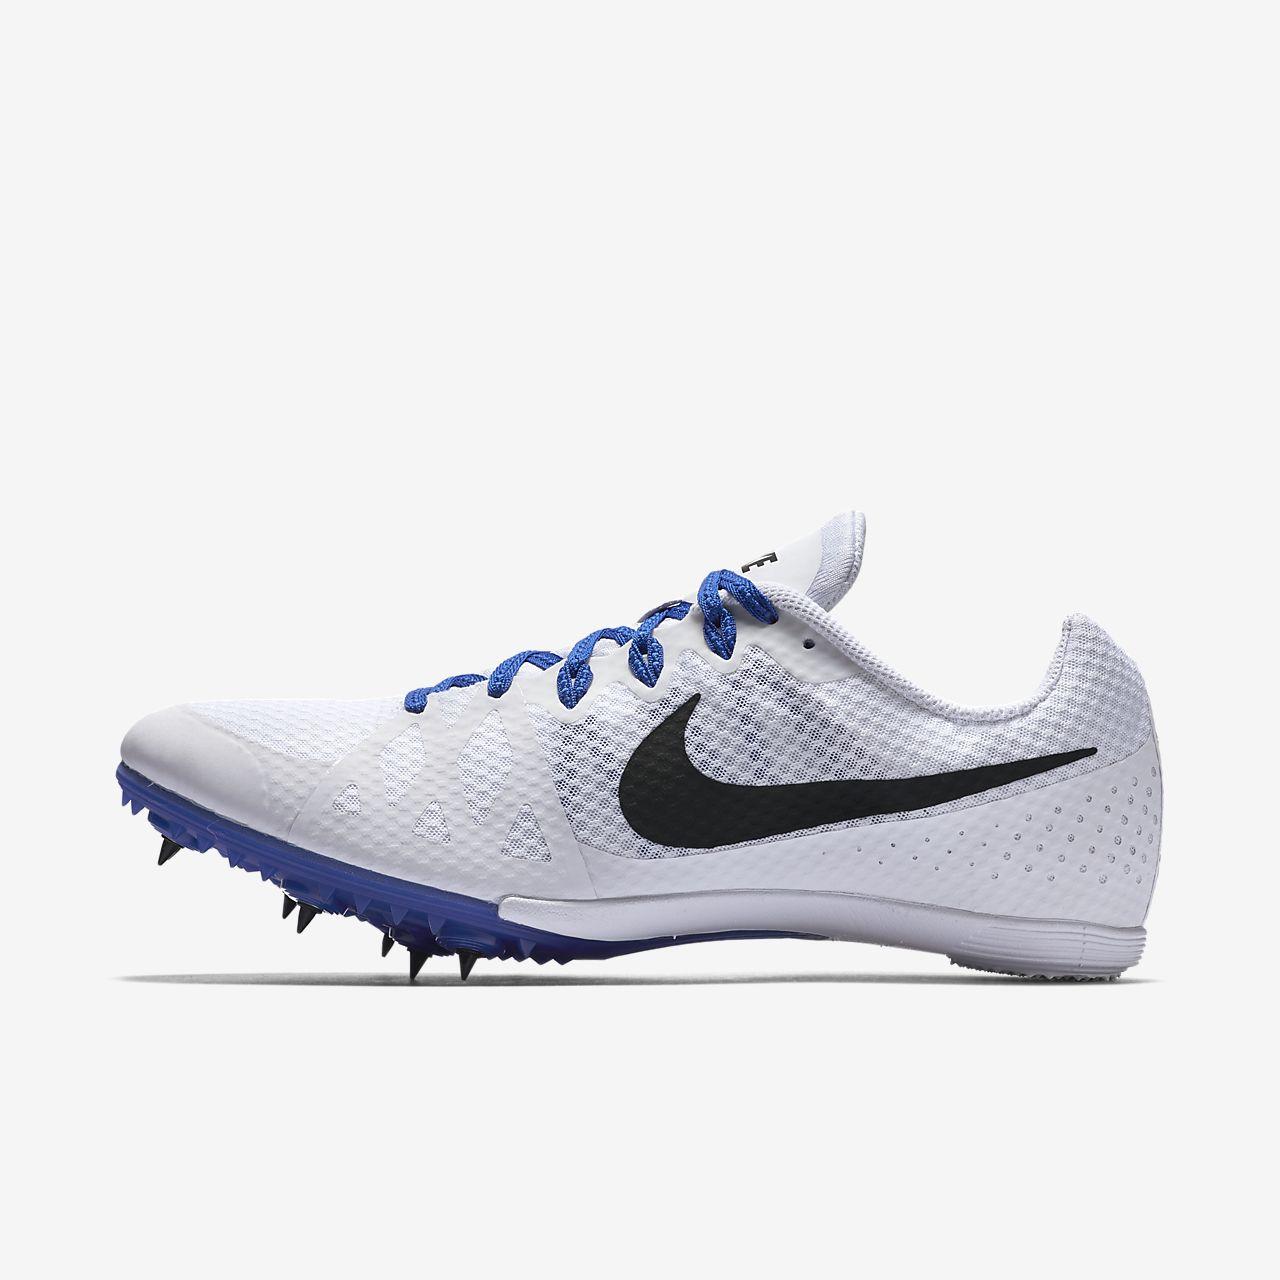 nike rival scarpe